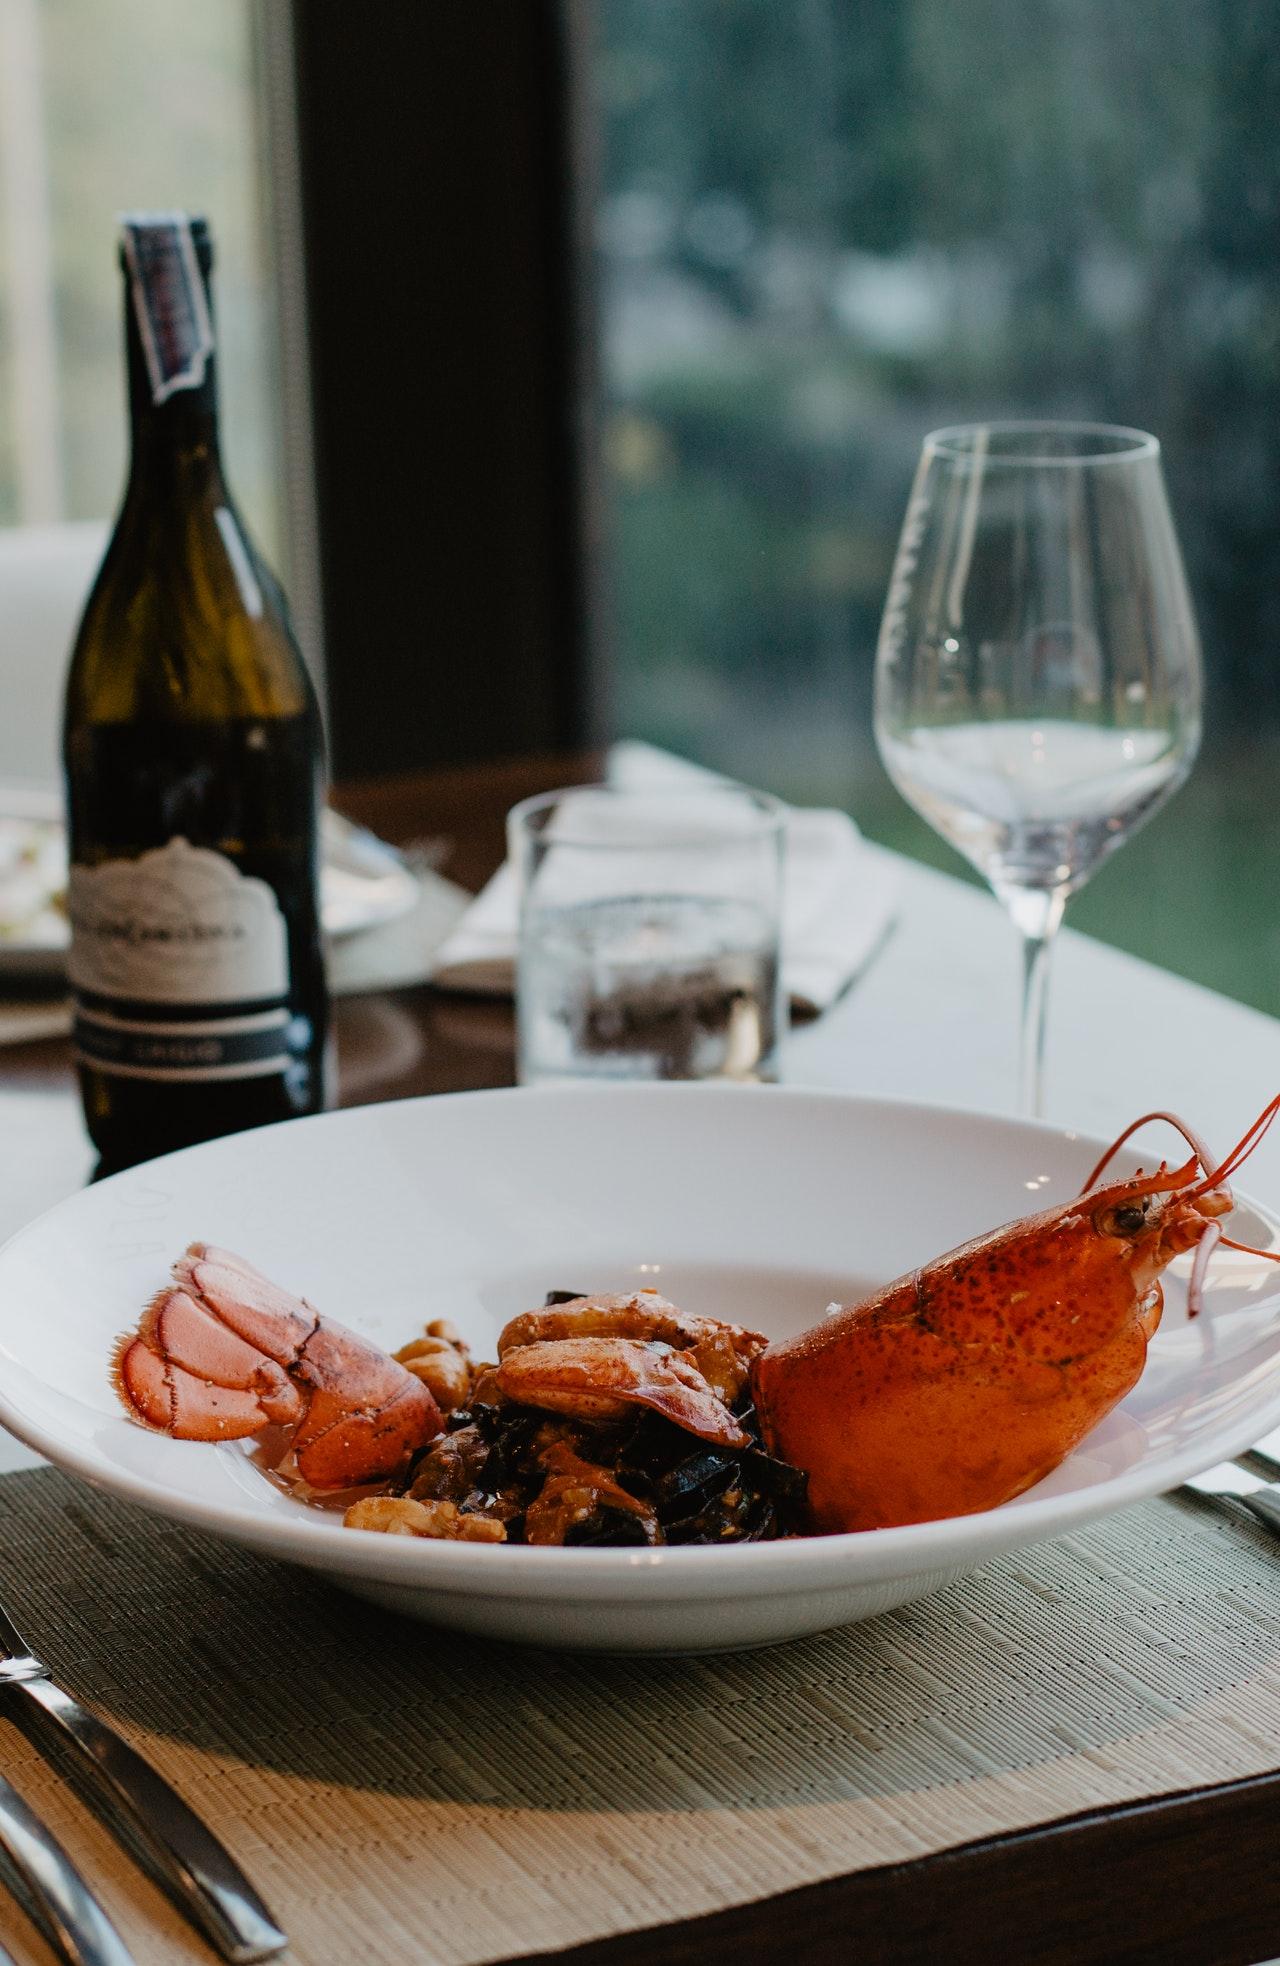 Buy_Lobster_Tails_Online_in_Marathon_warm_water_lobster